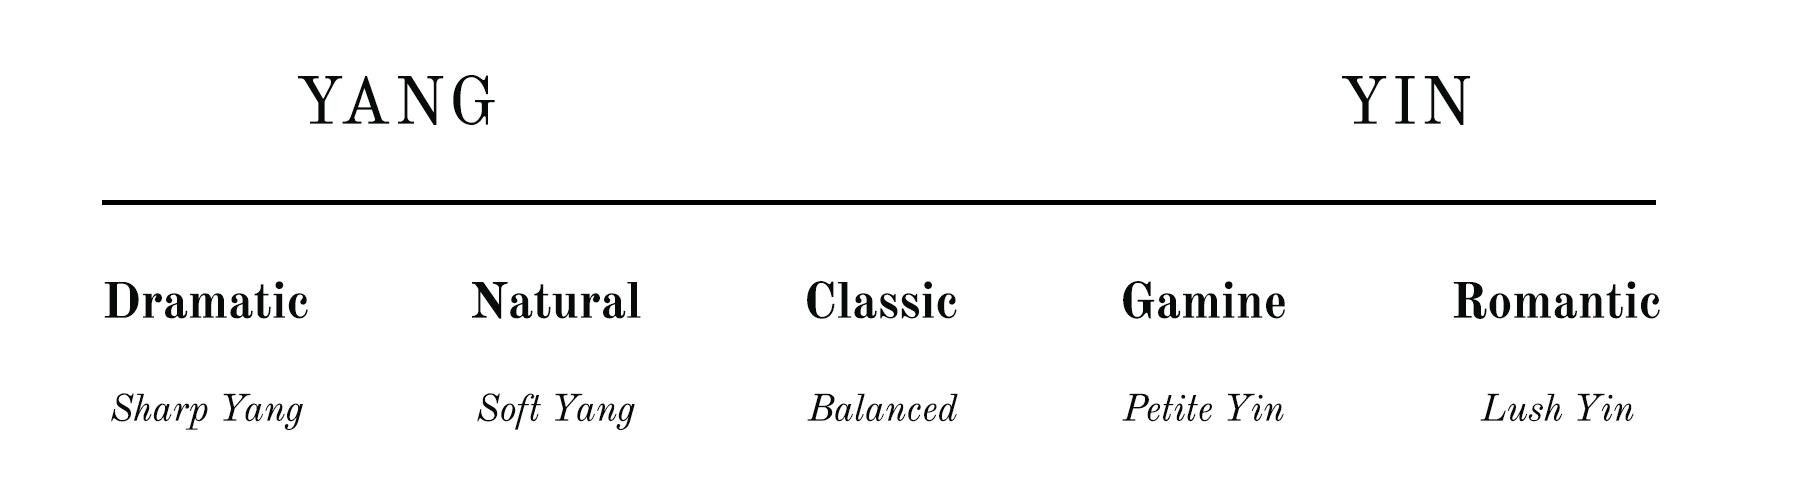 Kibbe Body Types - Yin-Yang Spectrum - the concept wardrobe